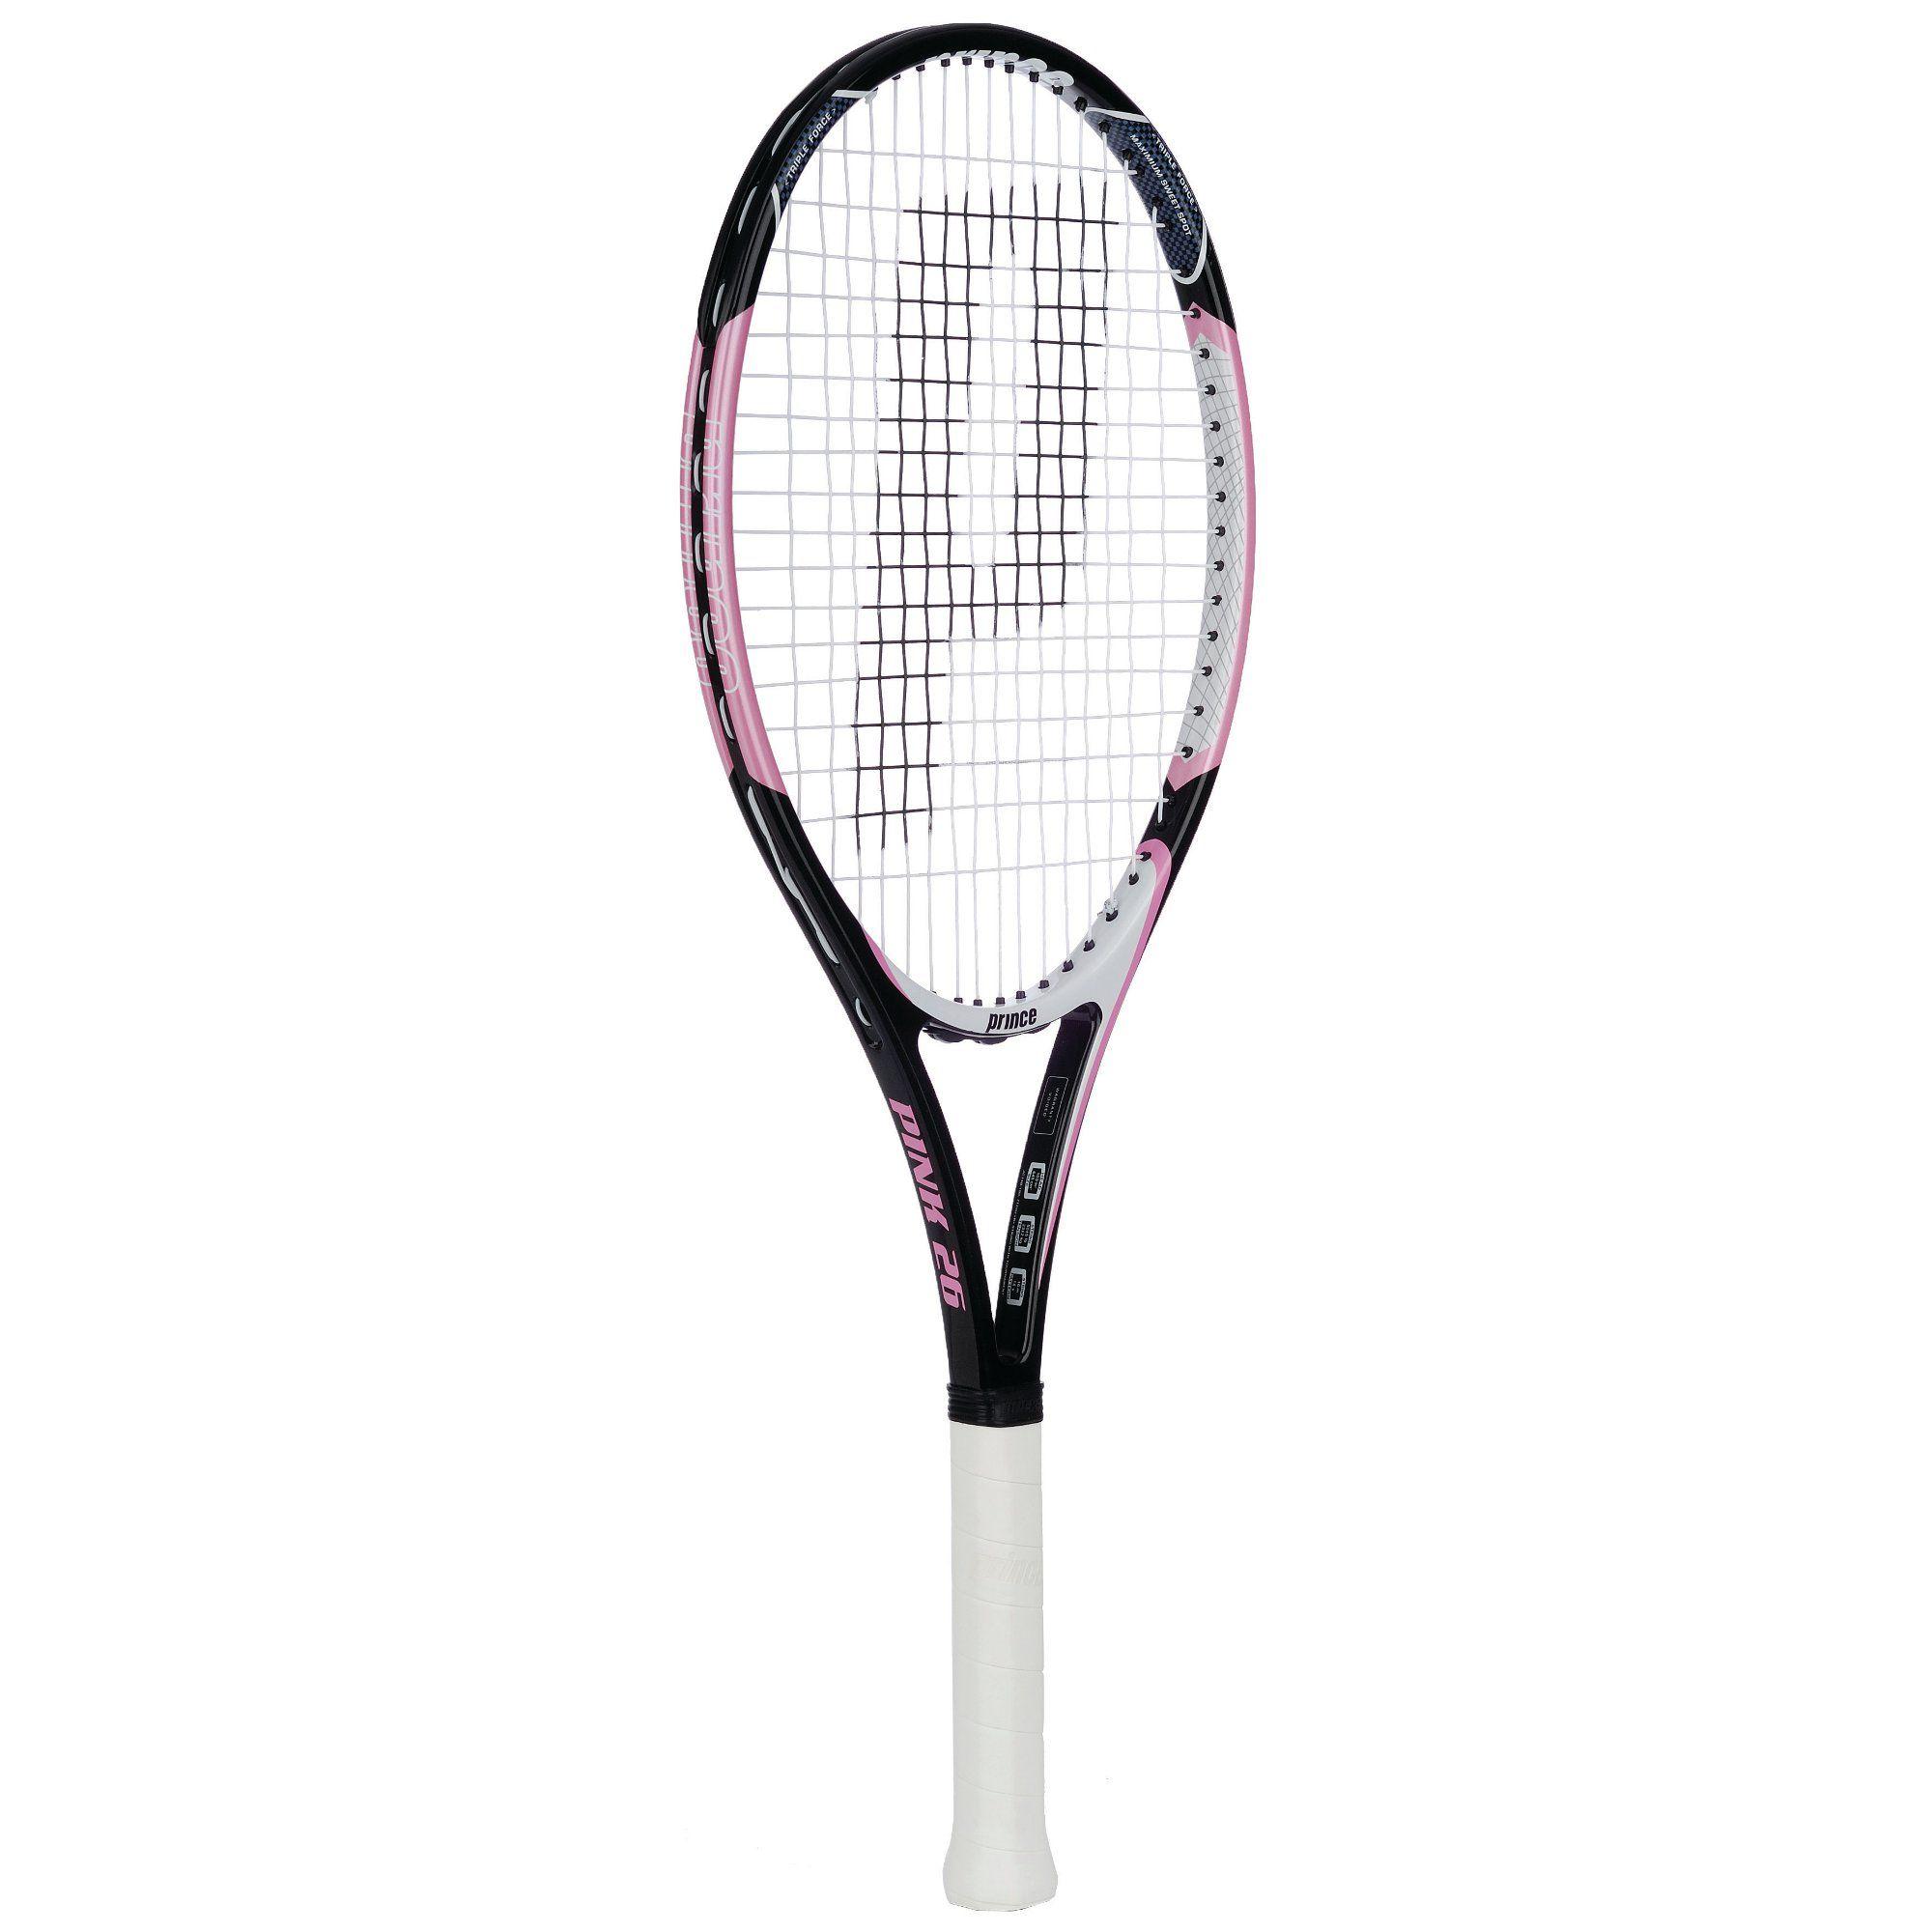 Prince Pink 26 Junior Tennis Racket - Sweatband.com